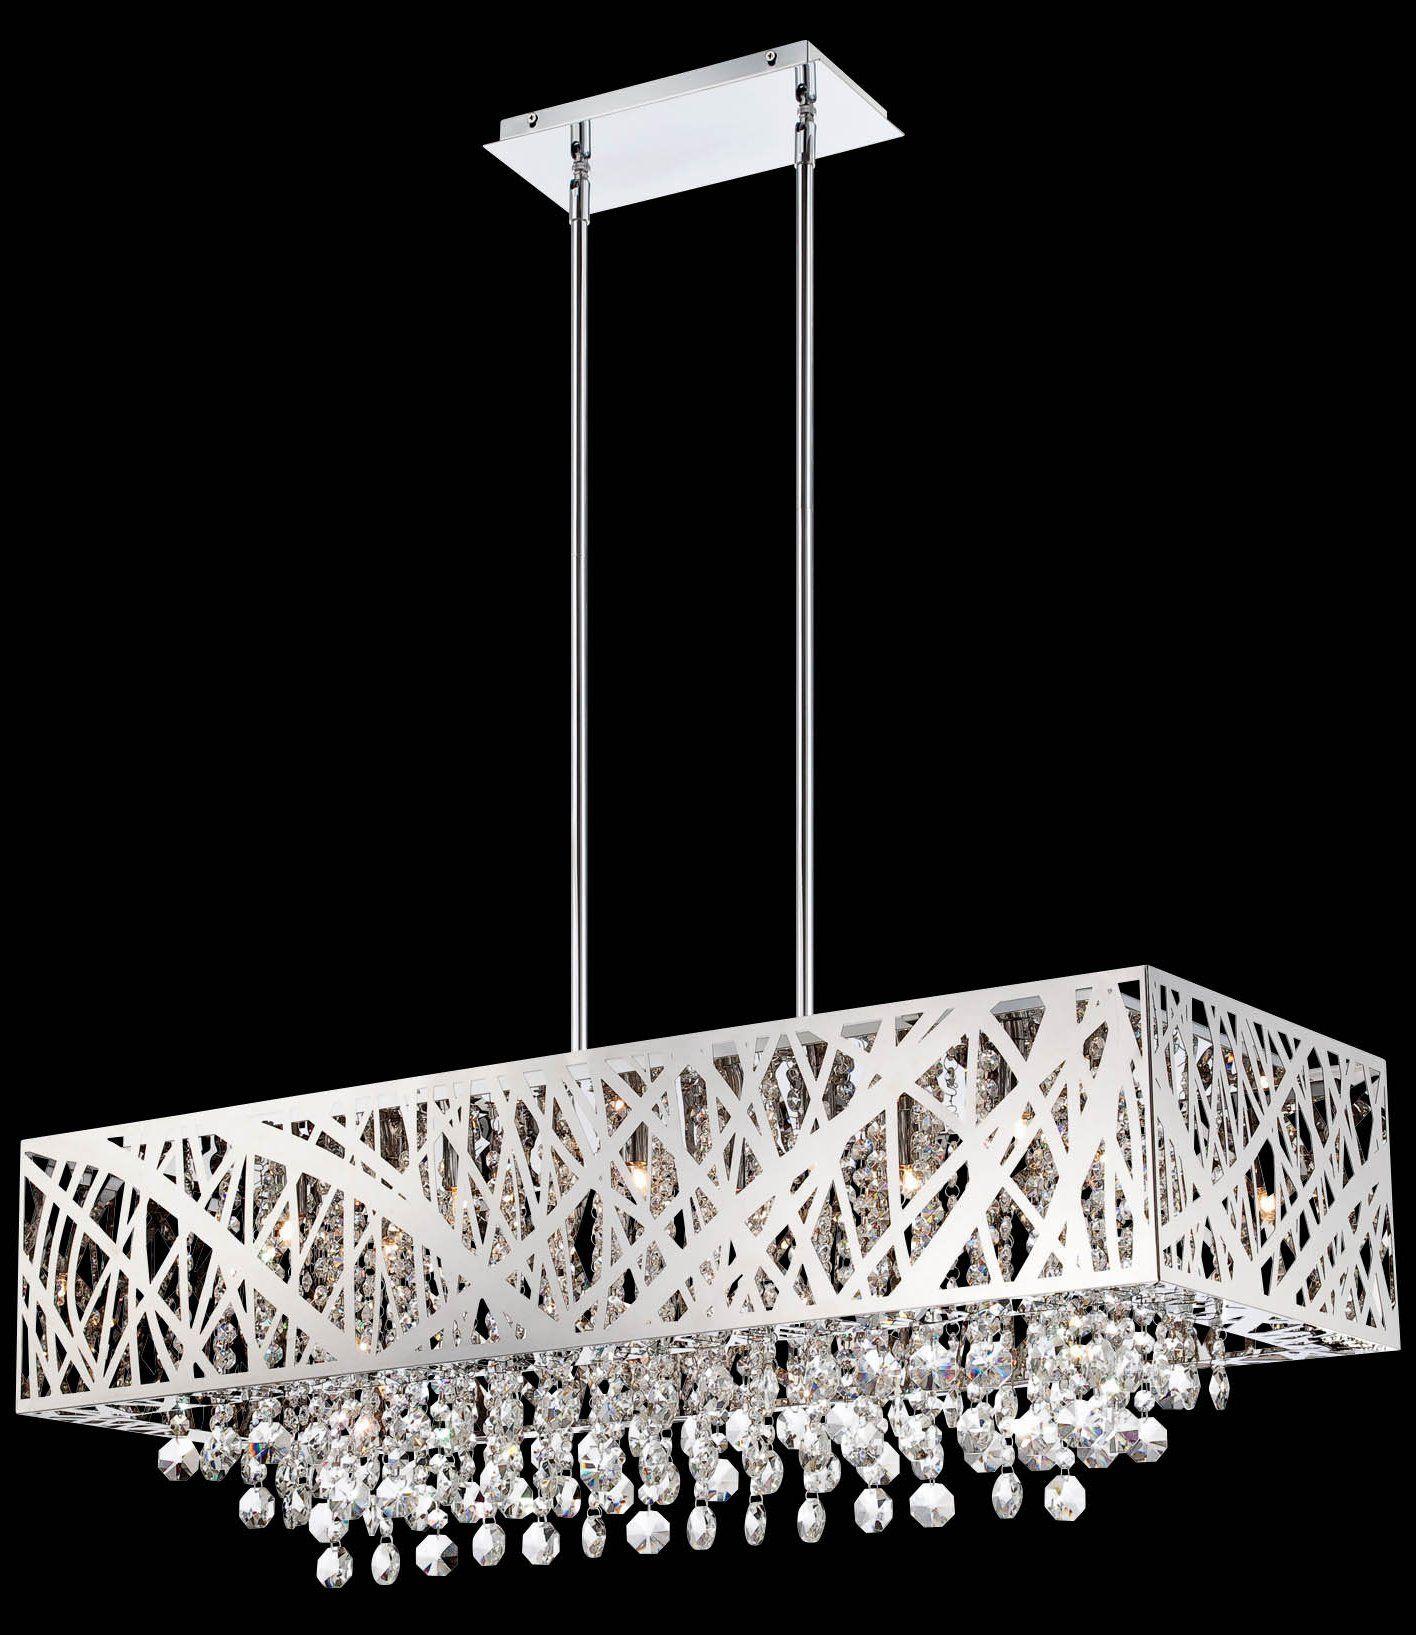 contemporary chandelier glass jean chandelierpendant modern murano light pendant